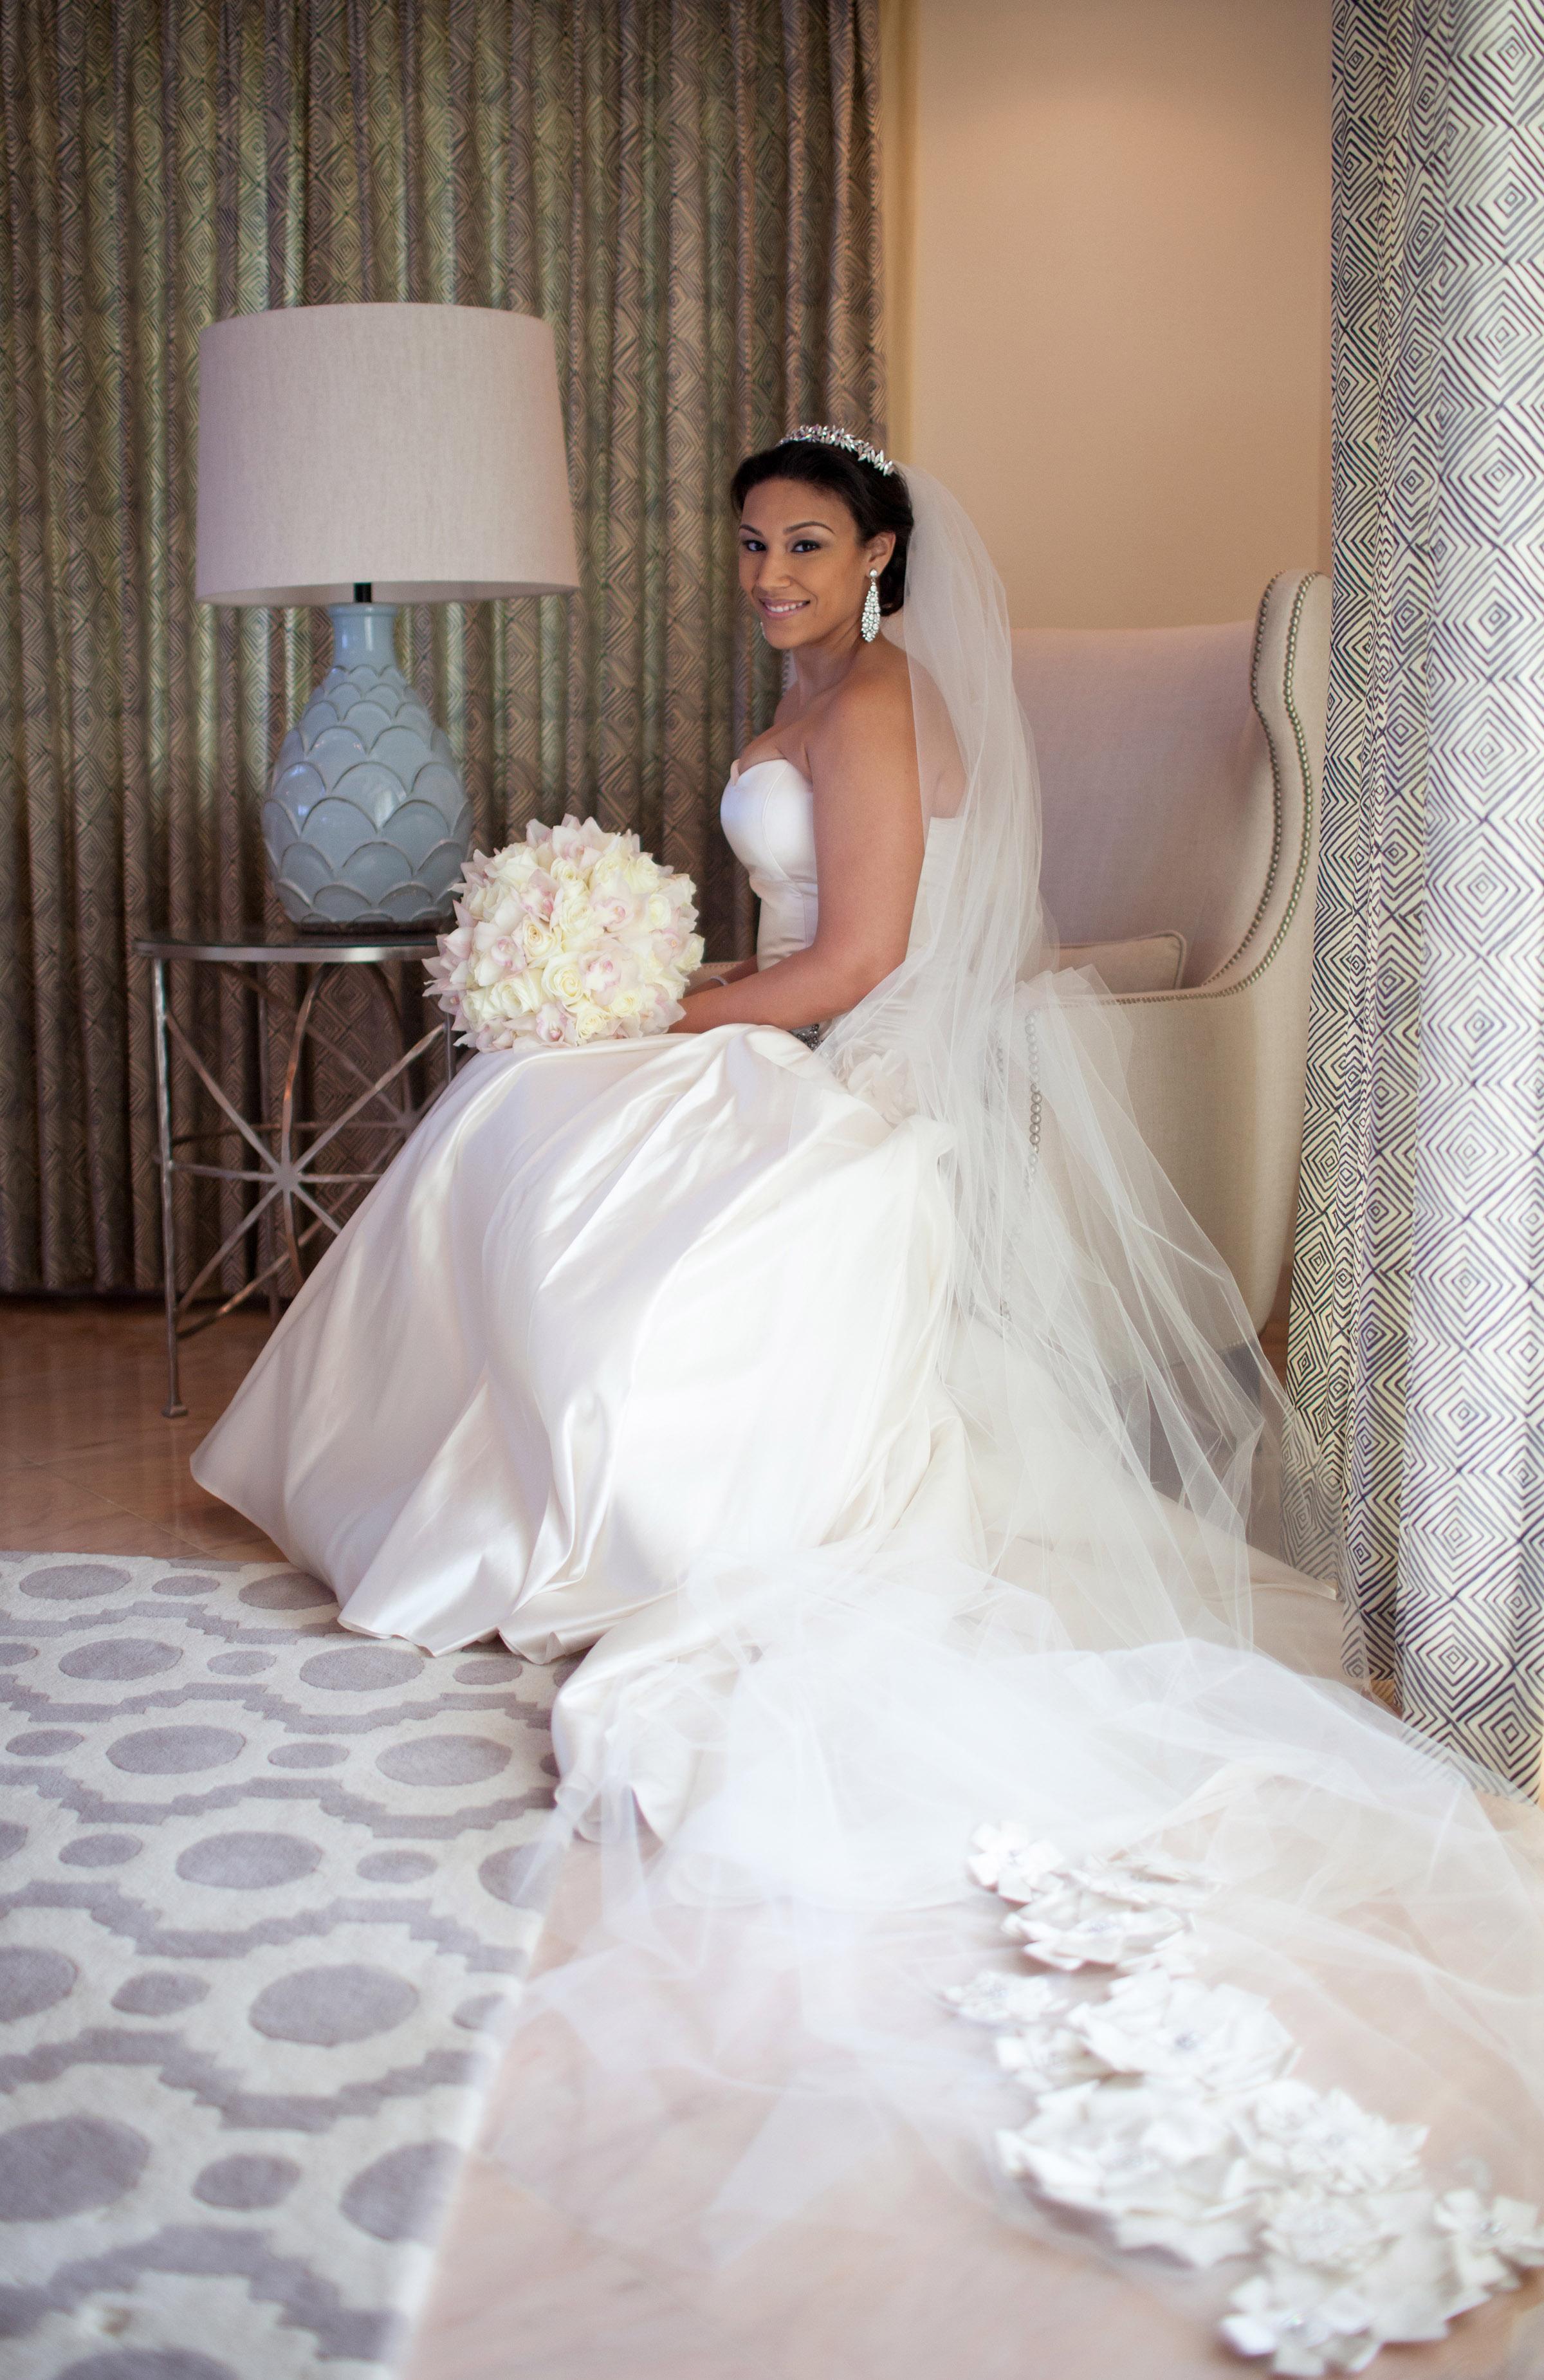 Nassau-Bahamas-Wedding-03